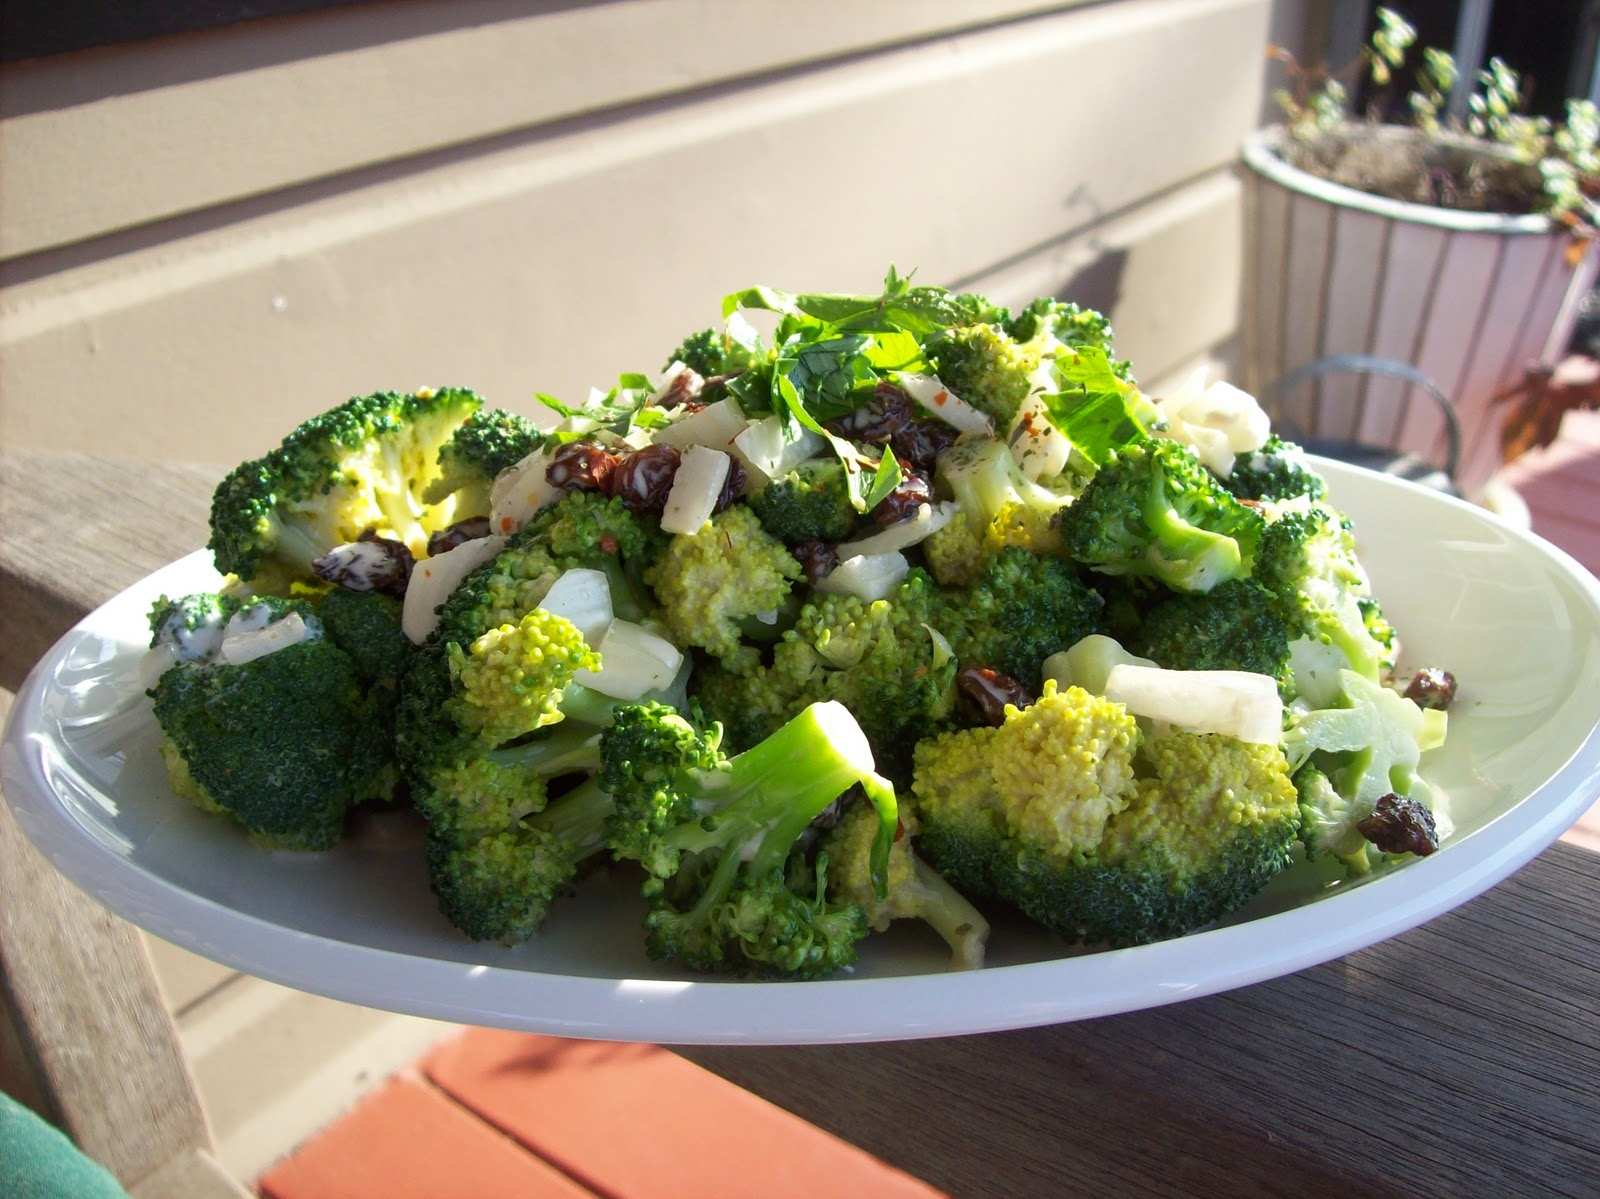 Napa Farmhouse 1885 Want Another Recipe For Broccoli Salad